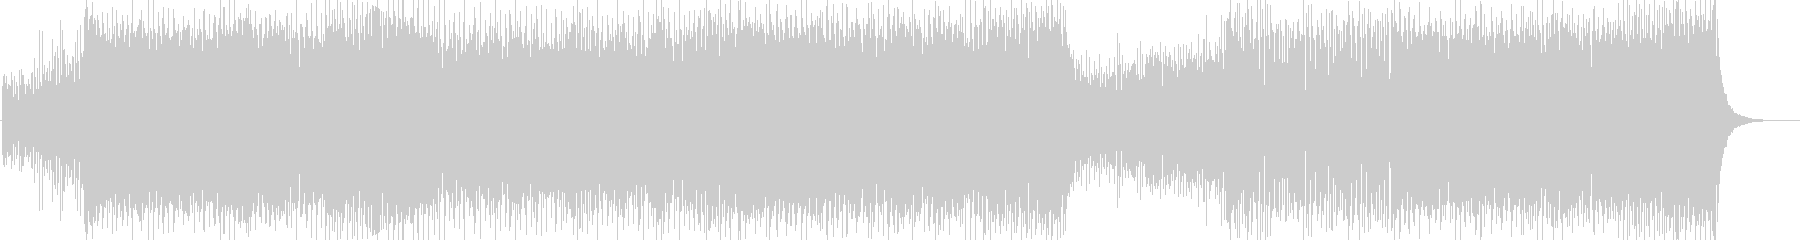 【EDMトランス】ラジオ・放送・映像向けの未再生の波形